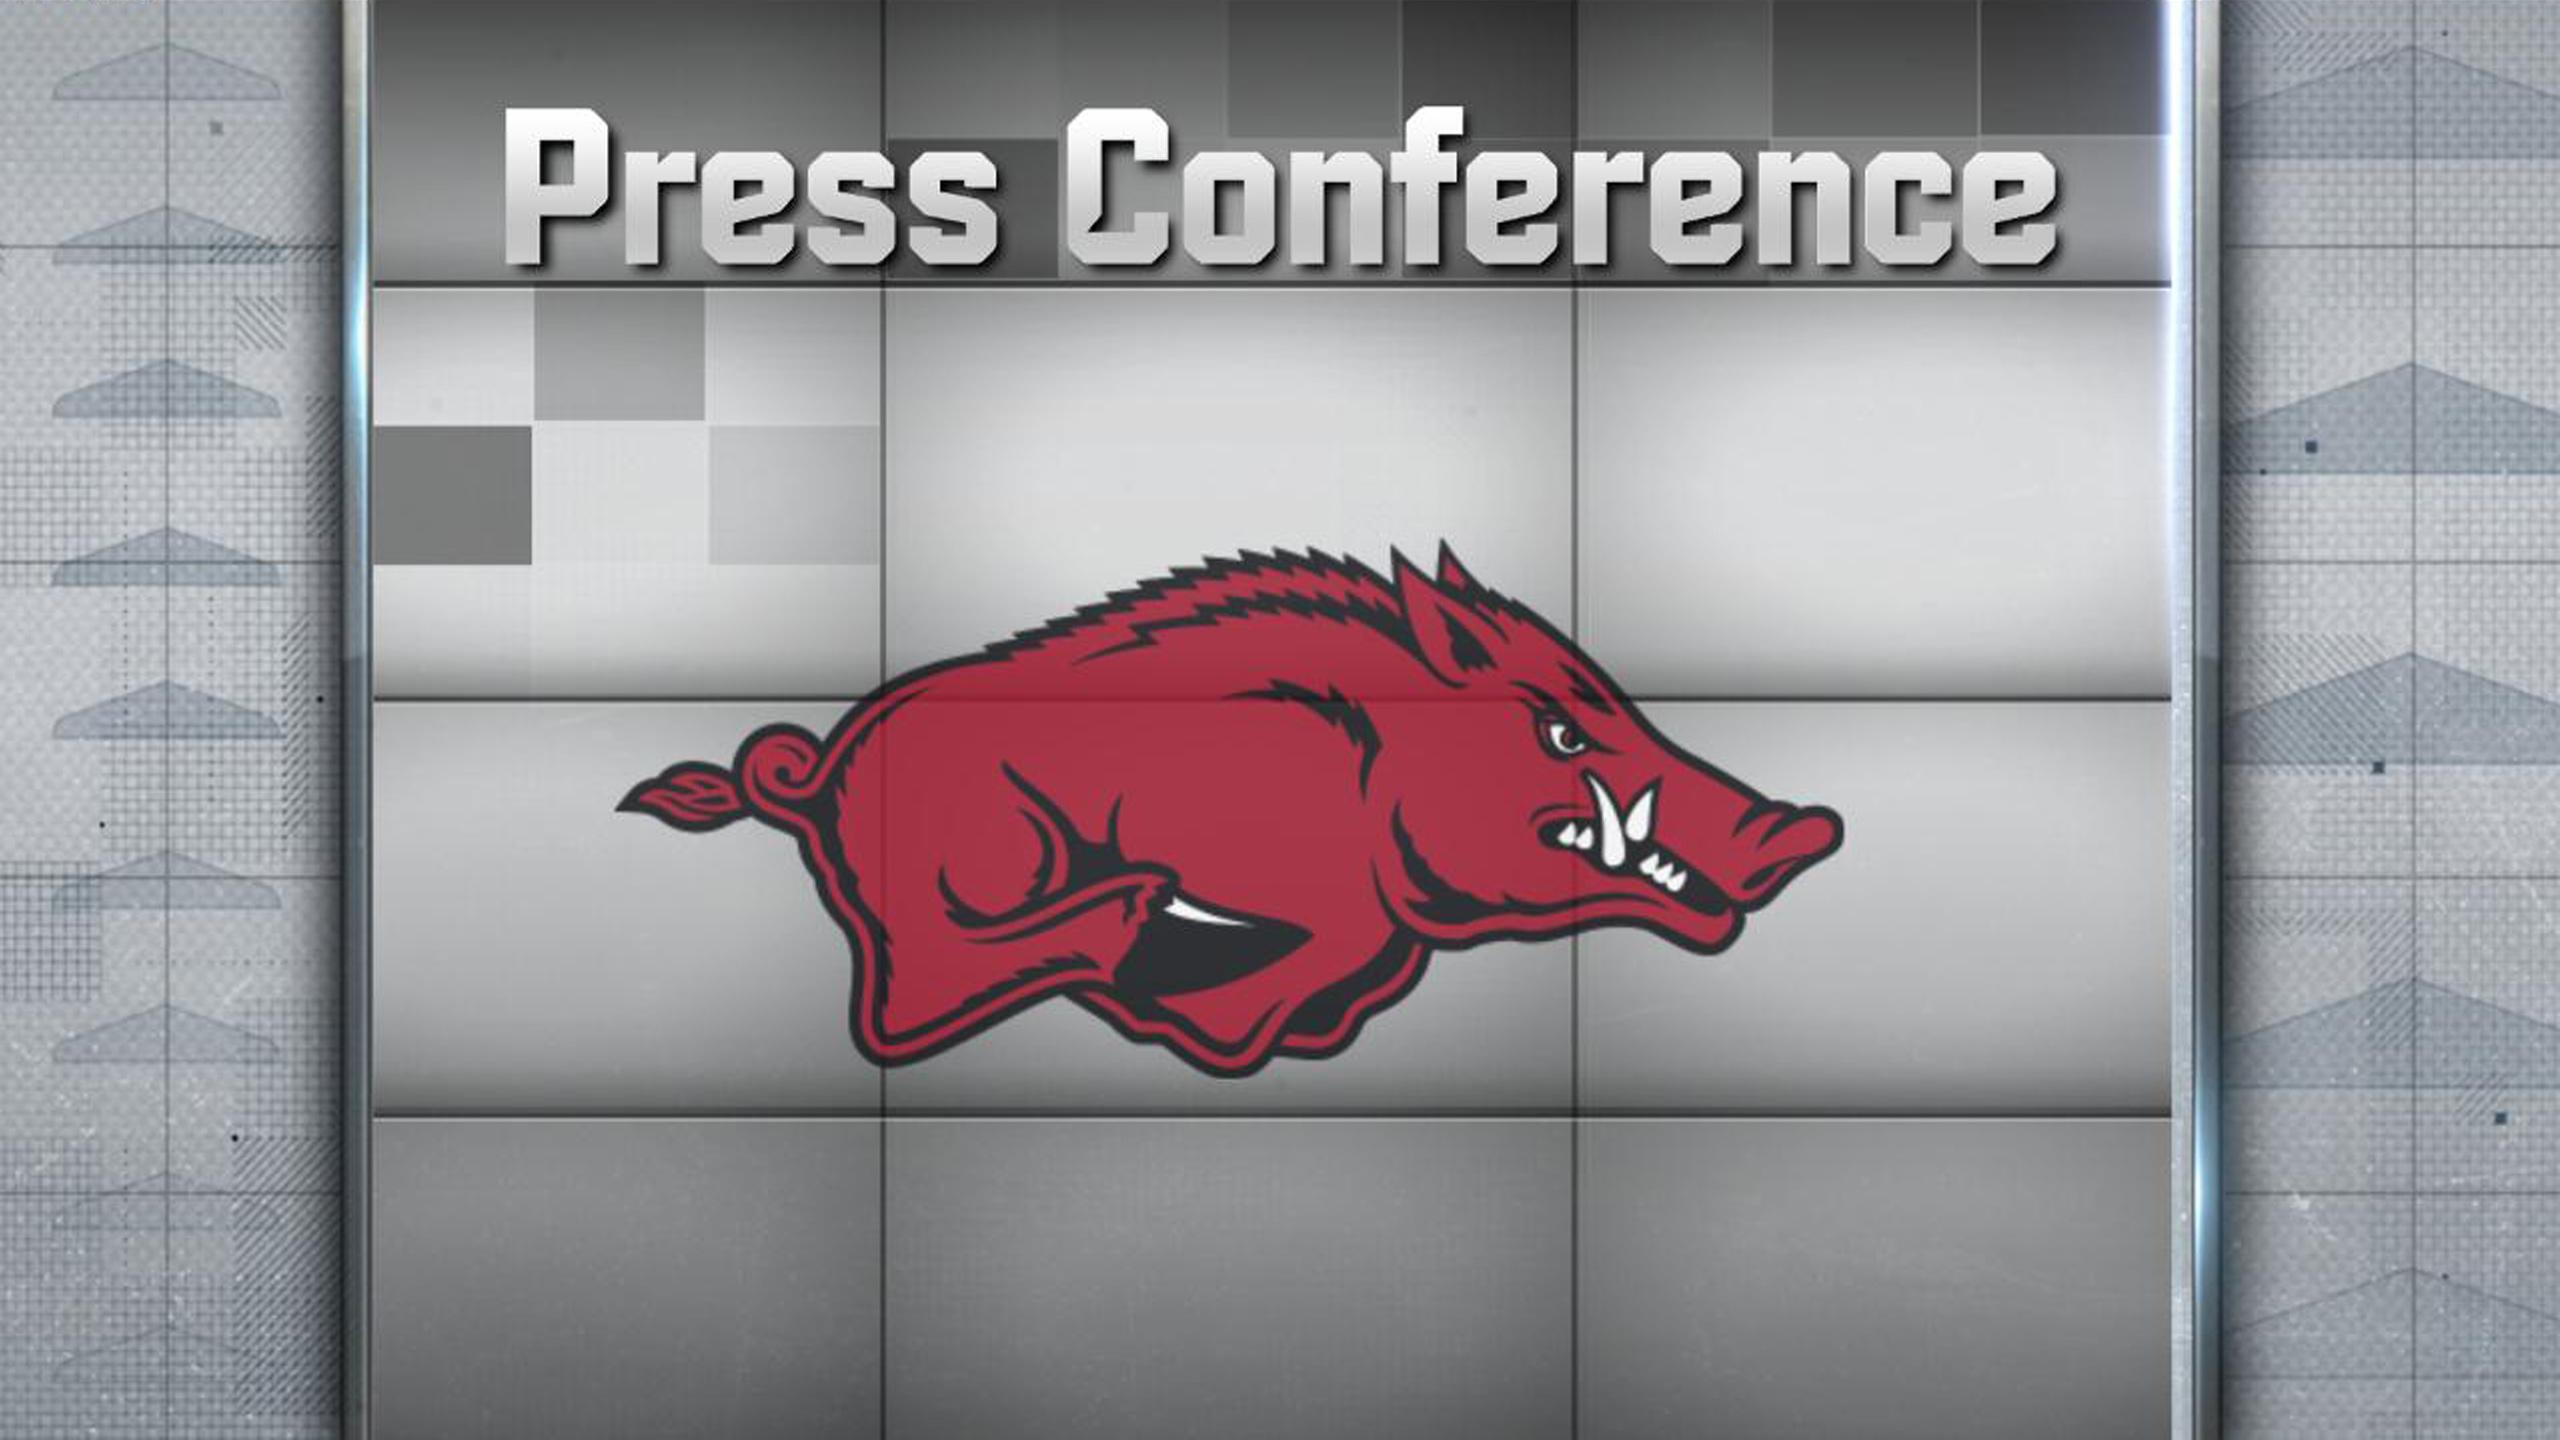 Arkansas Football Press Conference